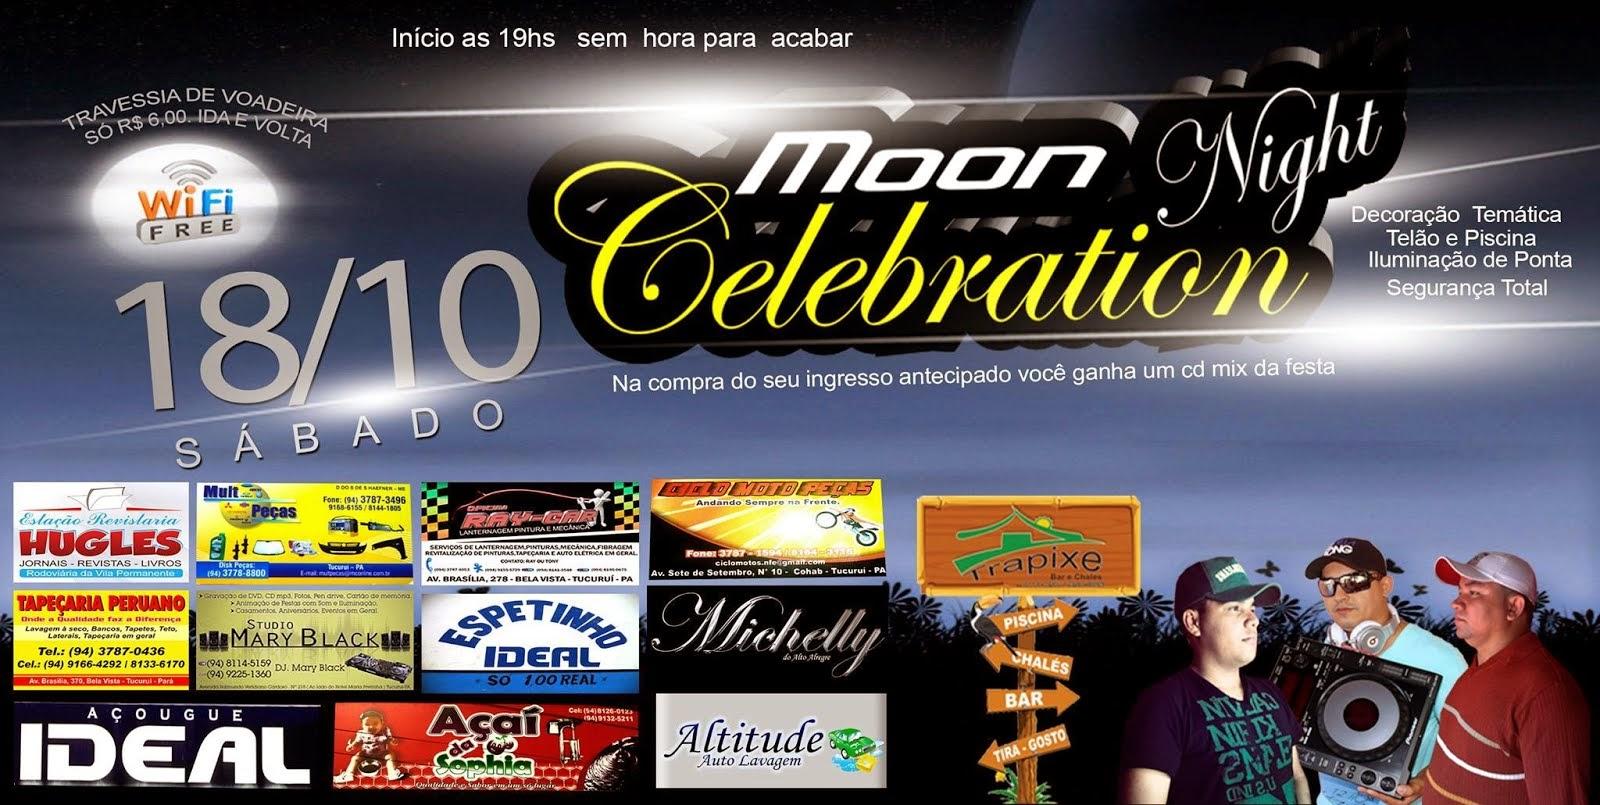 Moon Night Celebration: A festa do ano, hoje (18) a partir das 19 hno Trapiche Bar e Chalés